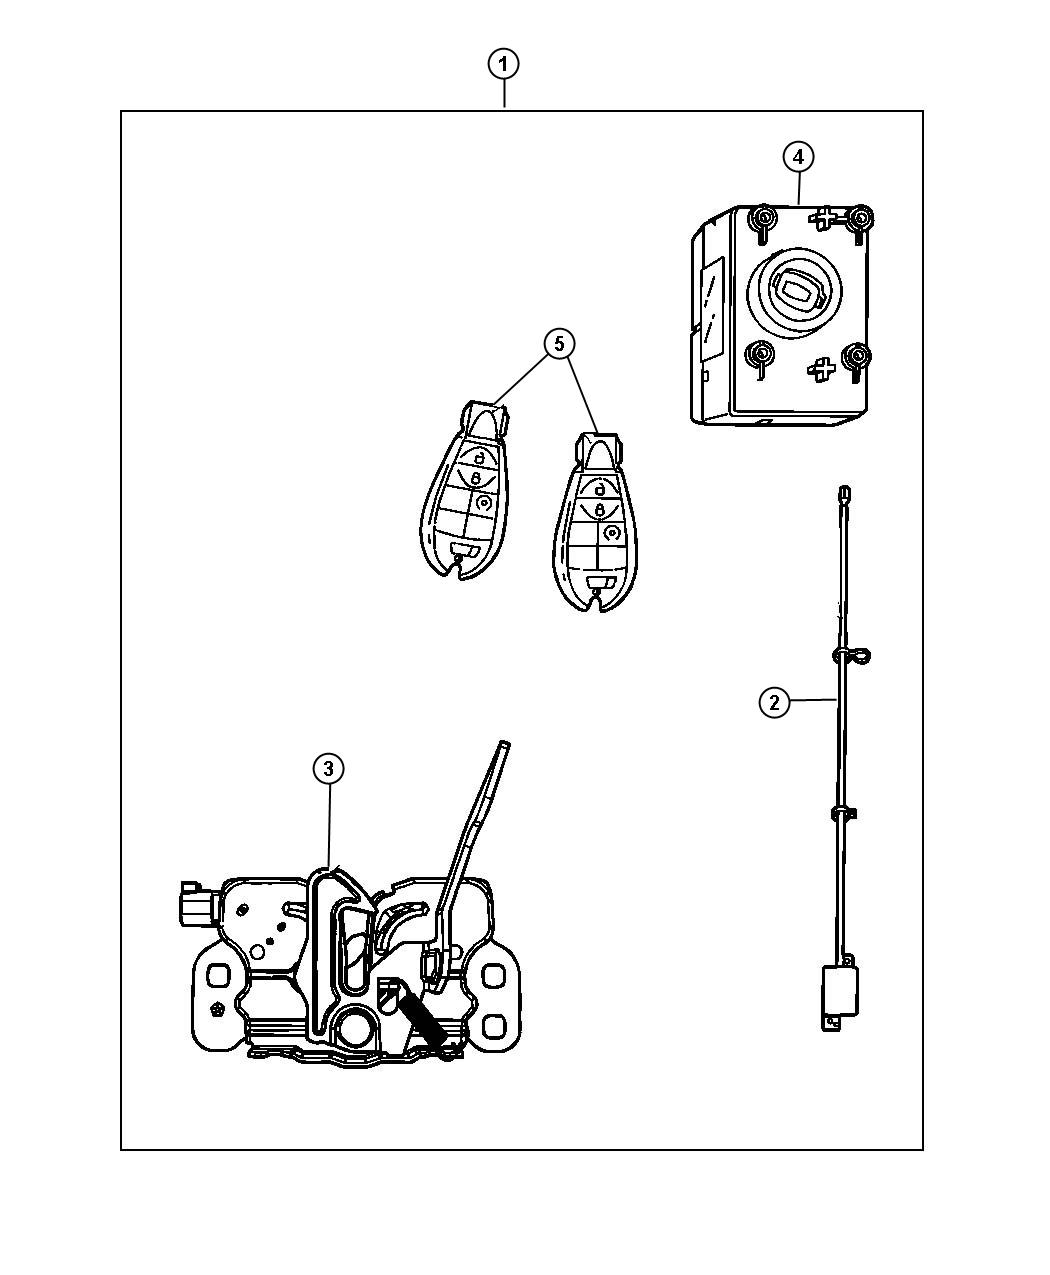 Jeep Grand Cherokee Transmitter Integrated Key Fob Trim